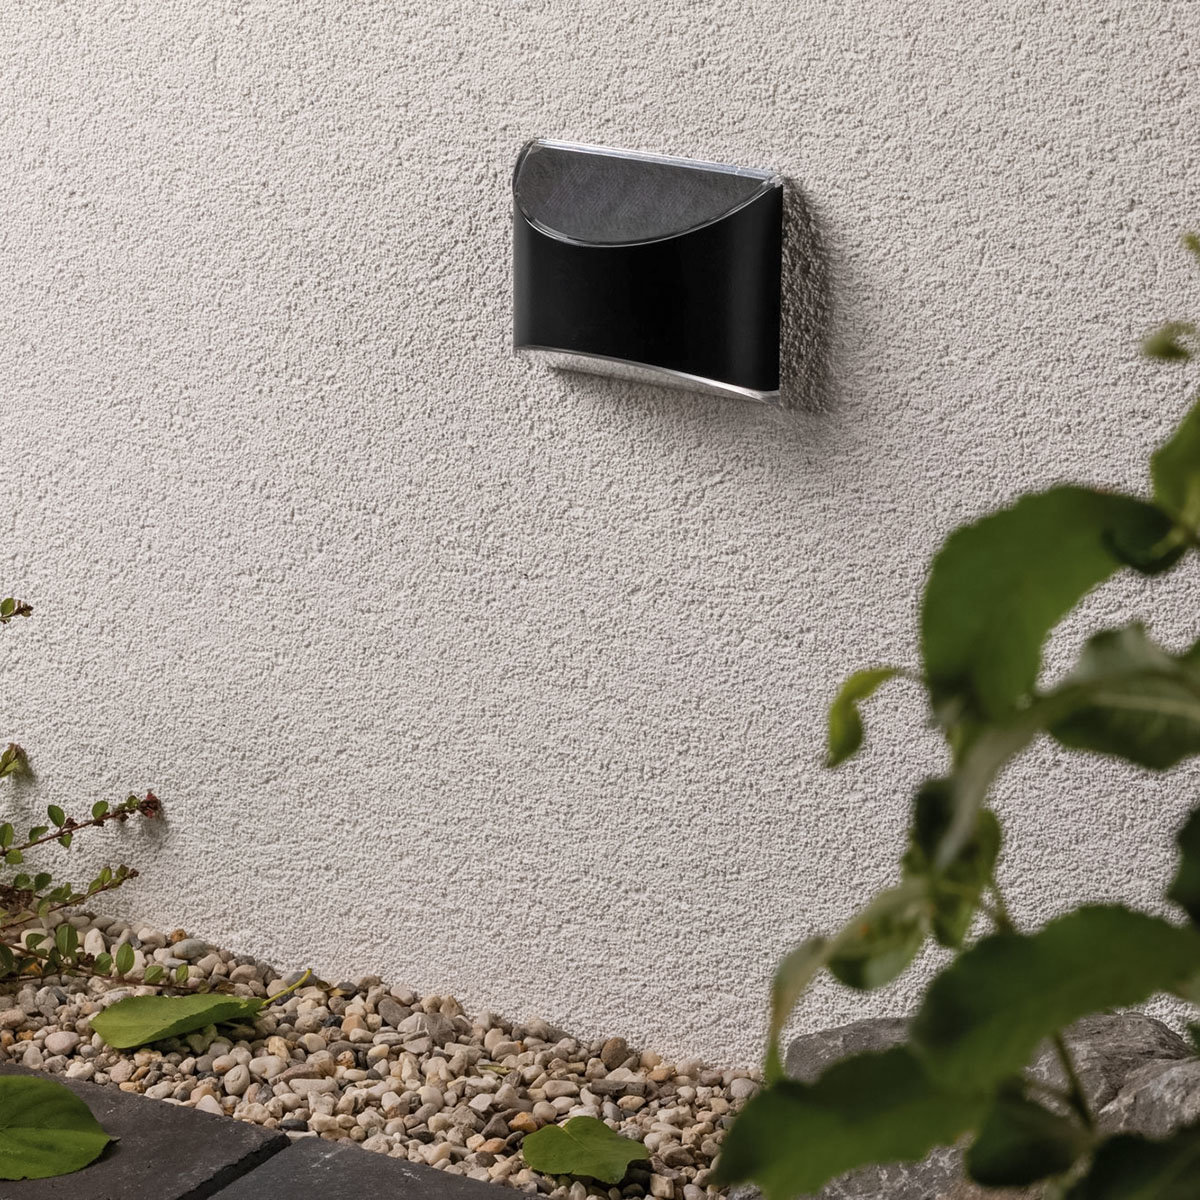 Outdoor Solar Wegeleuchte Elliot, 3000K 7lm IP44 Metall/Kunststoff, anthrazit | #2